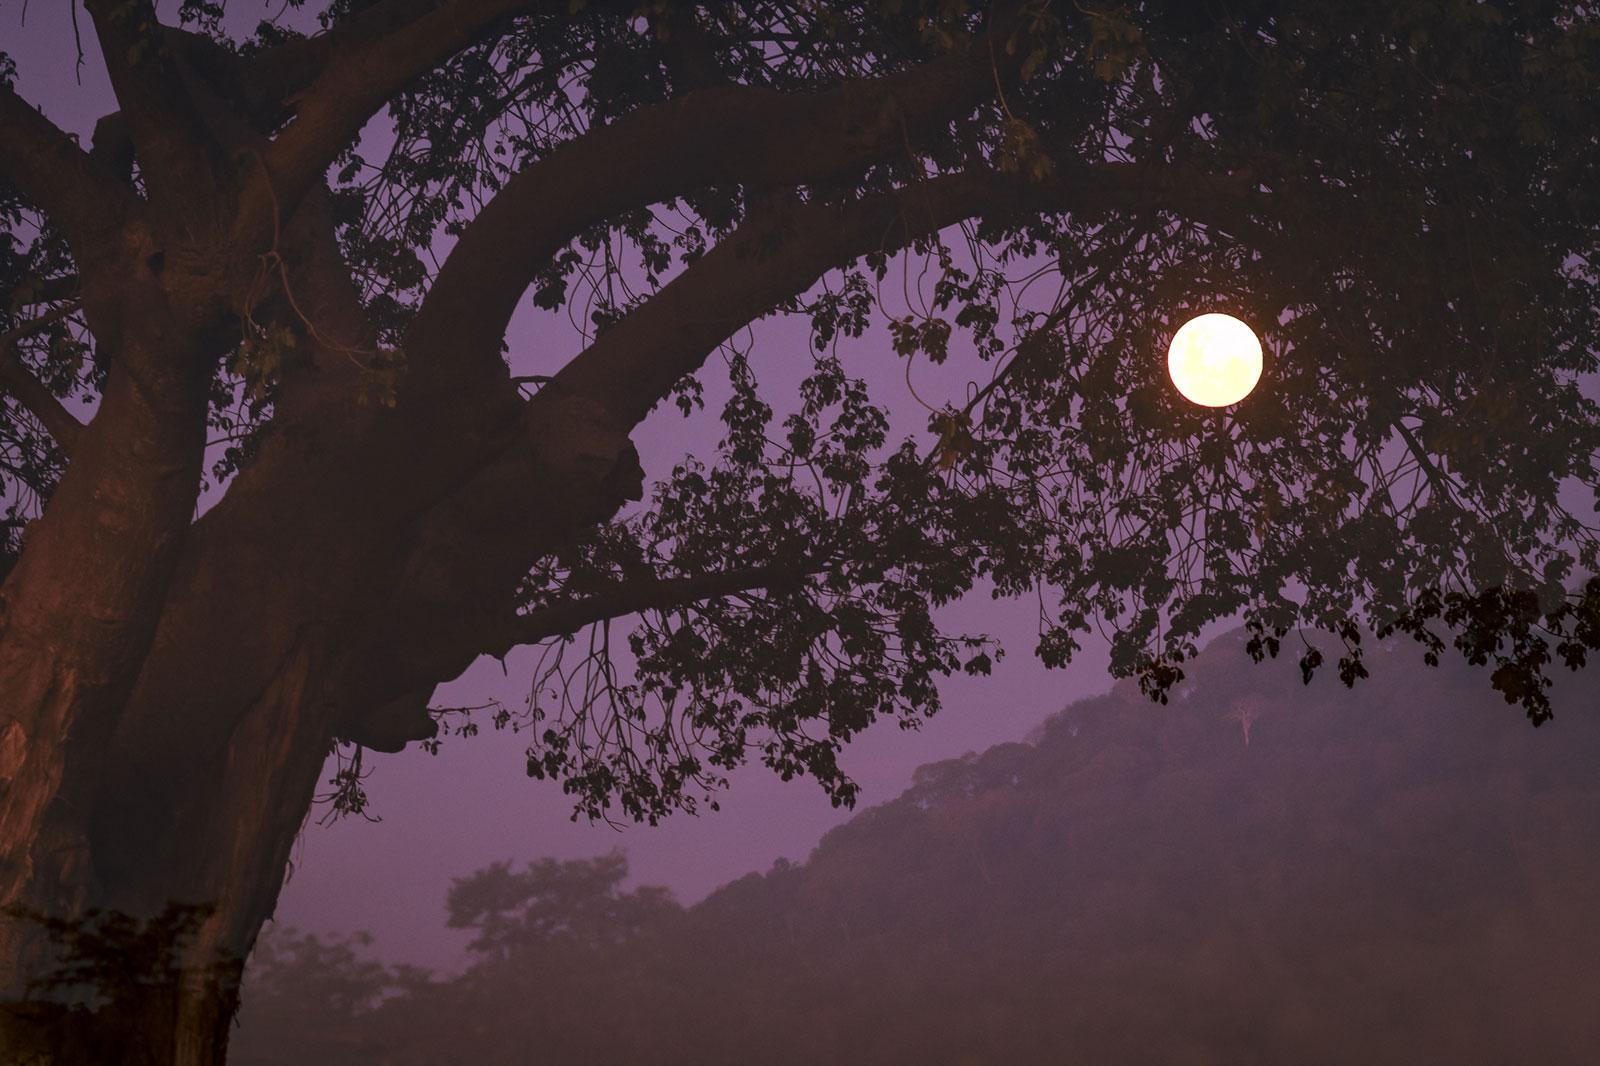 Ghoha Hills Full Moon Em Gatland